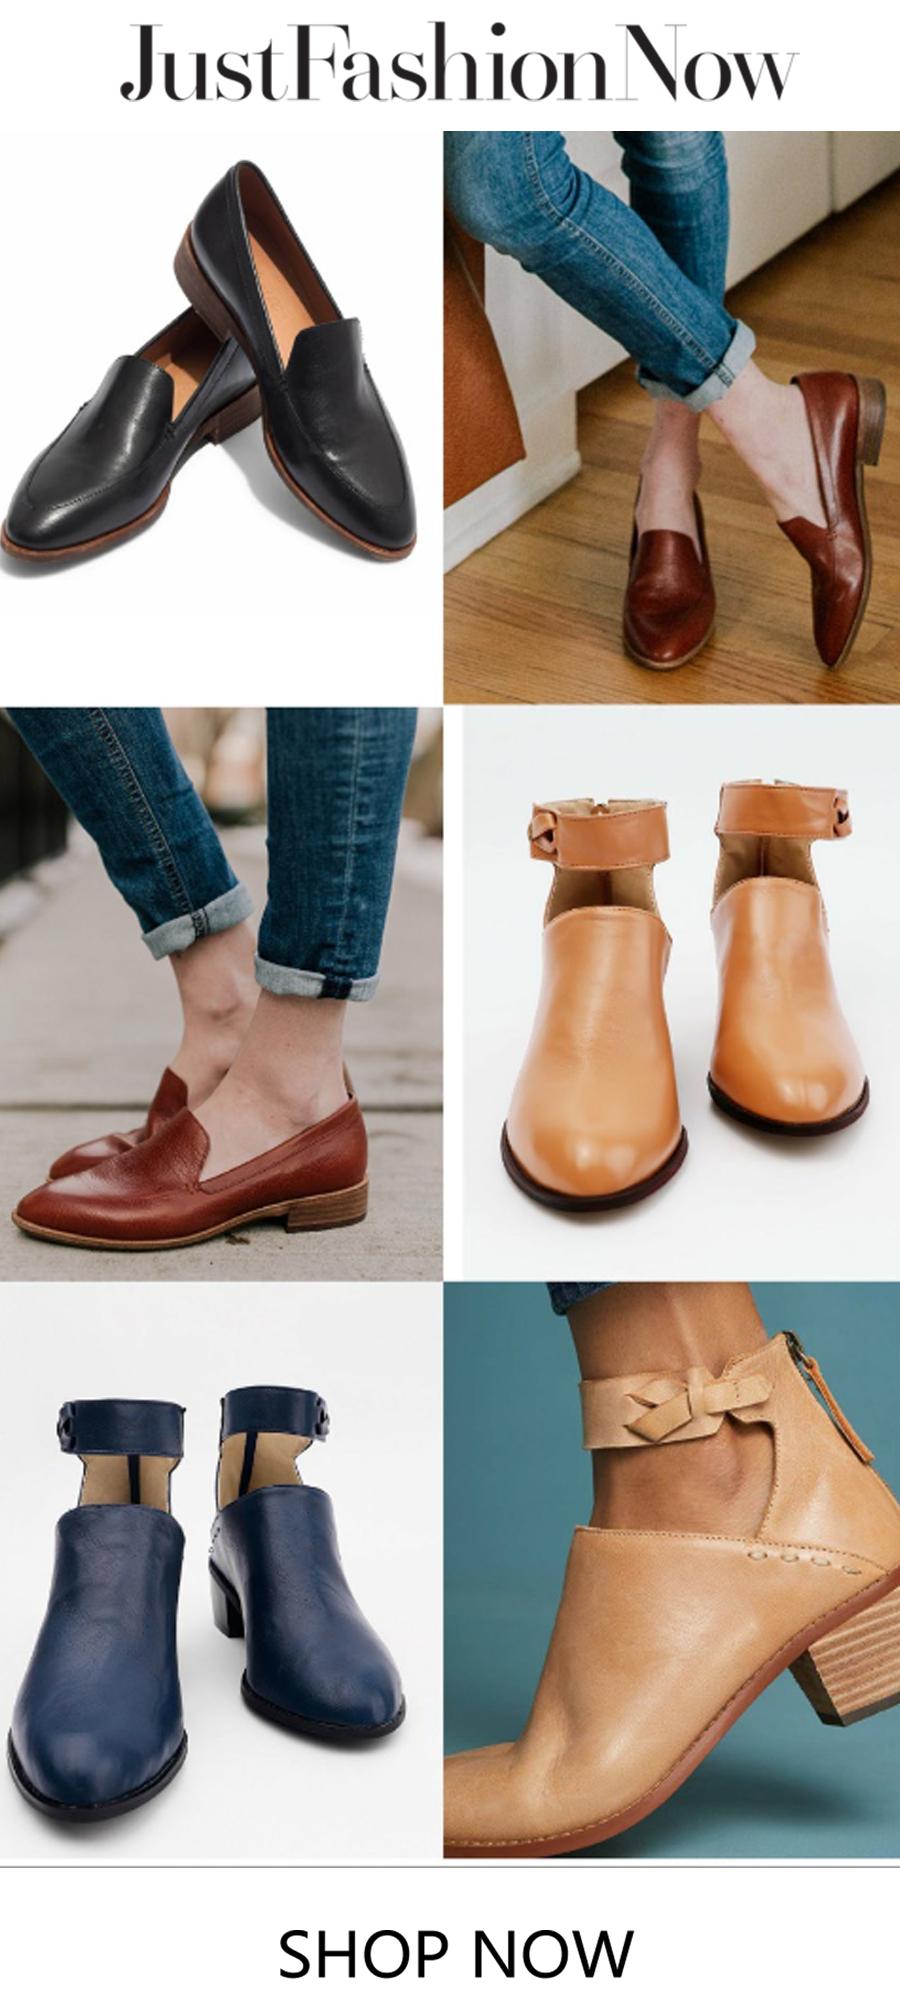 Winter Boots Women Shoes Boots Casual Shoes Fall Fashion Fall Back To School Shoes Summer Women S Women Shoes Online Womens Fashion Shoes Autumn Fashion [ 2000 x 900 Pixel ]